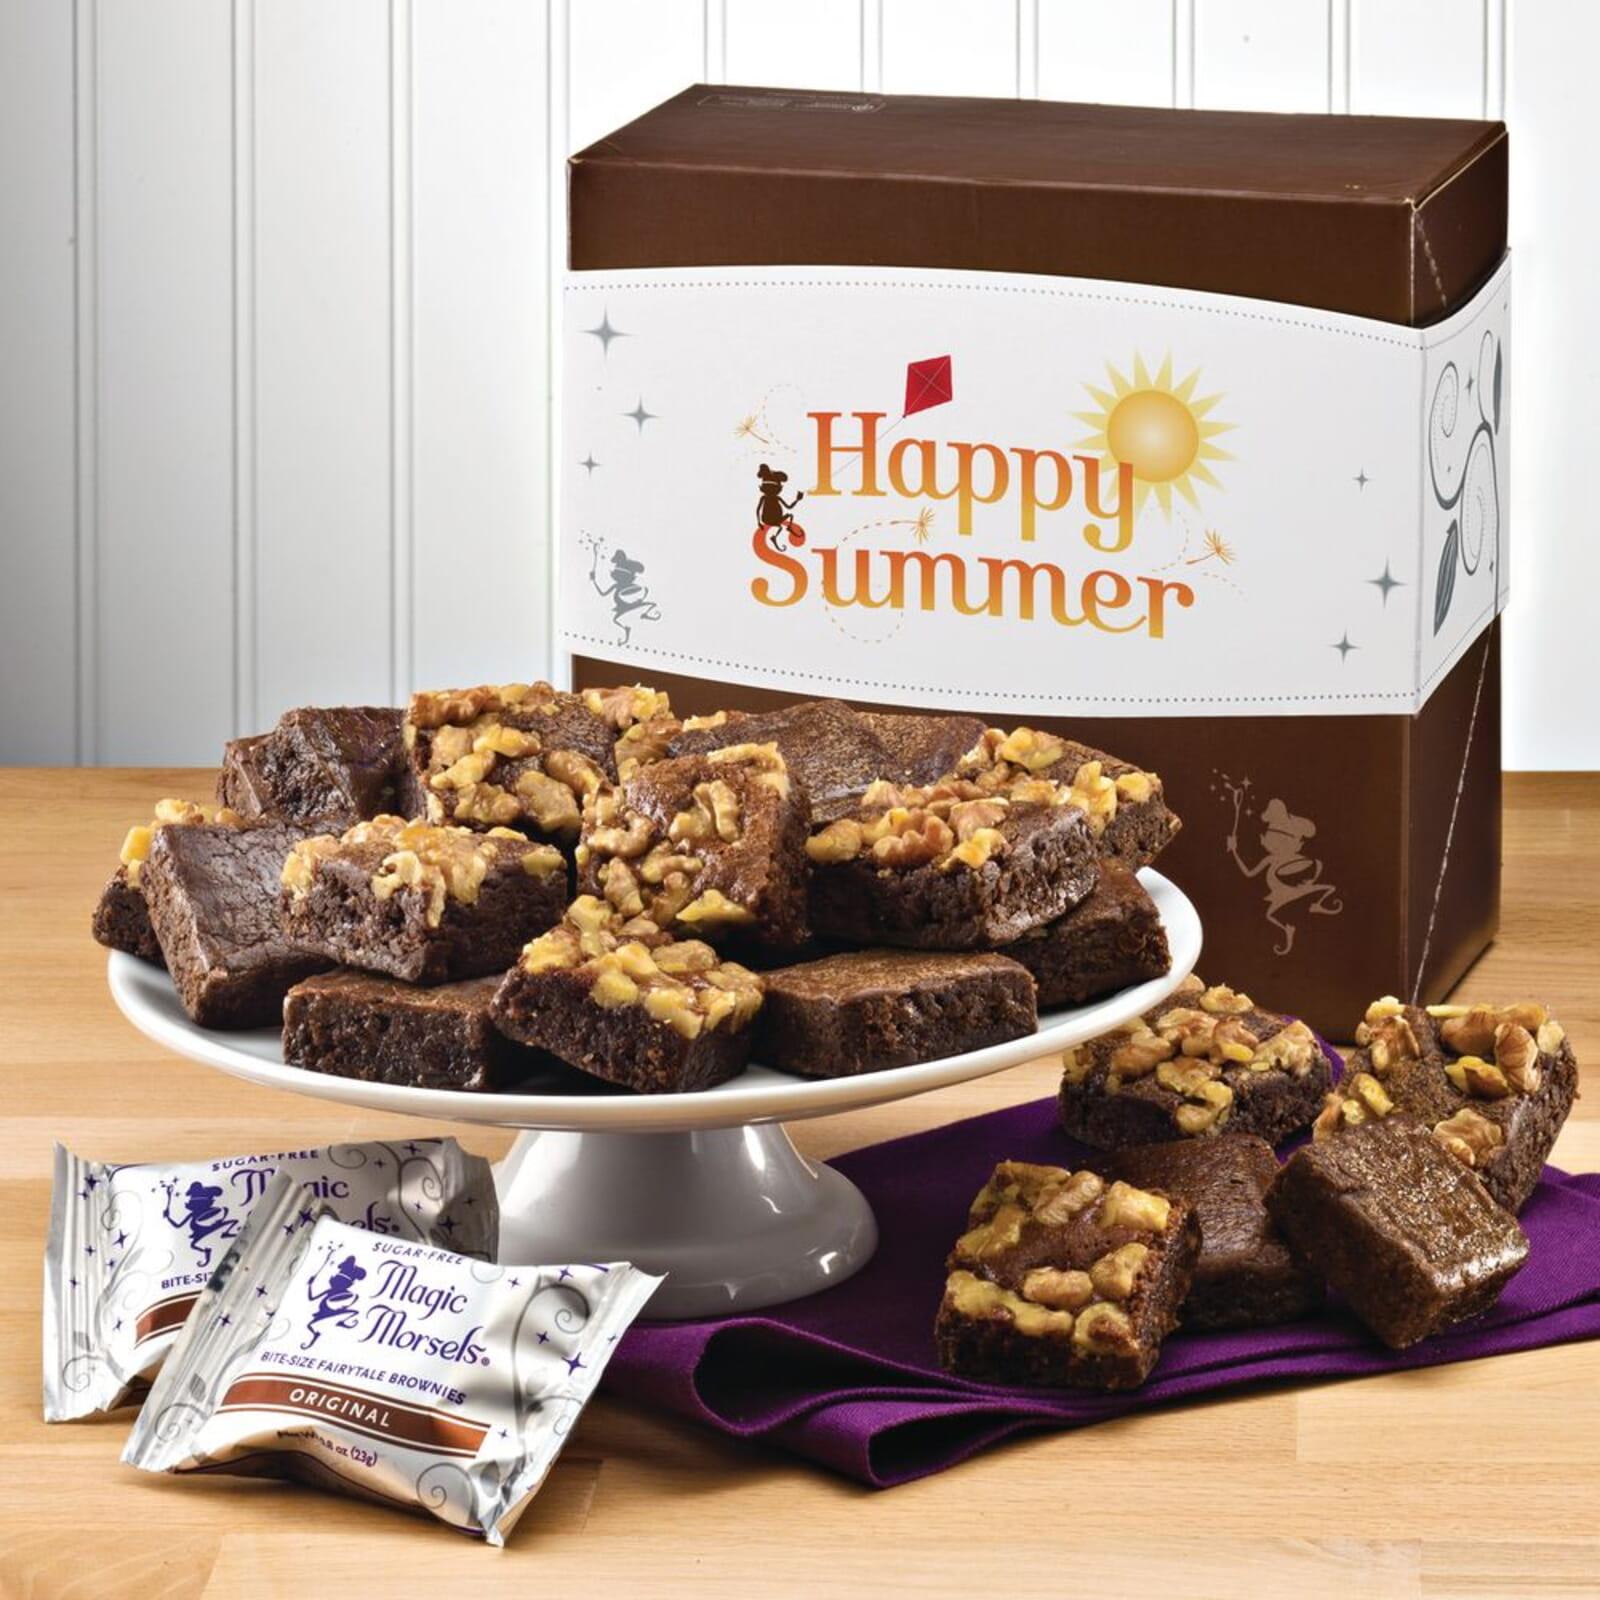 Summer Sugar-Free Morsel 48 Choose Your Own